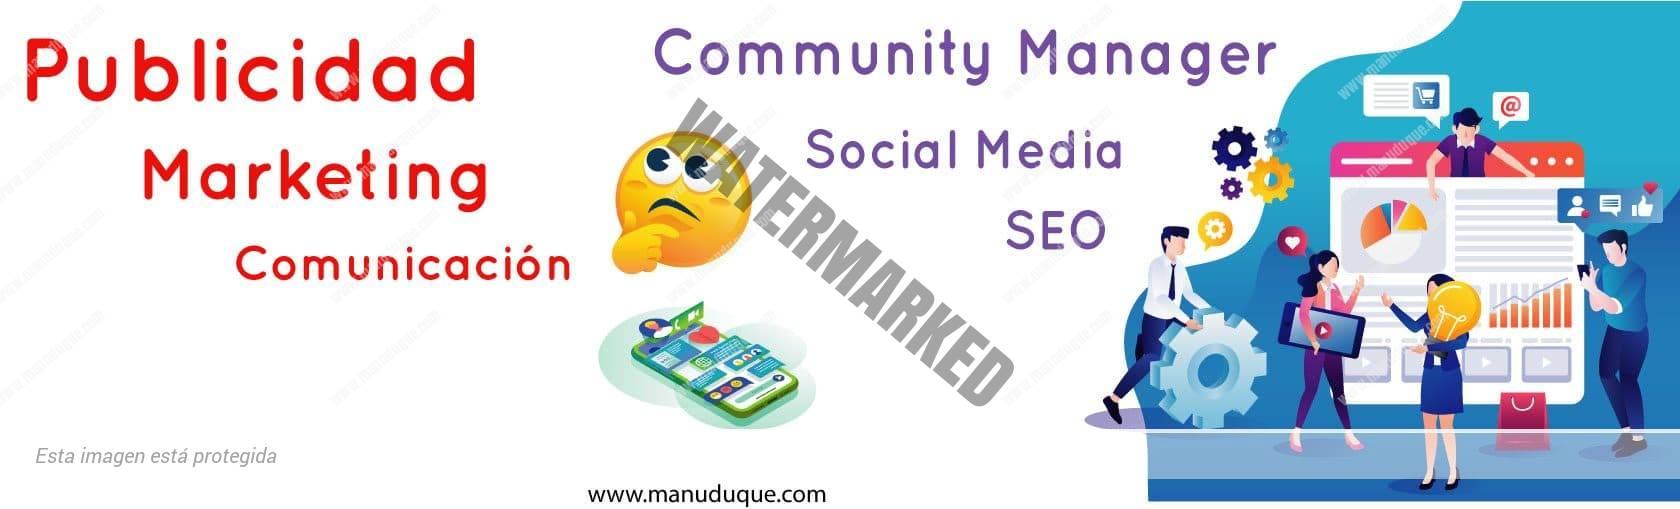 Blog Community Manager & SEO